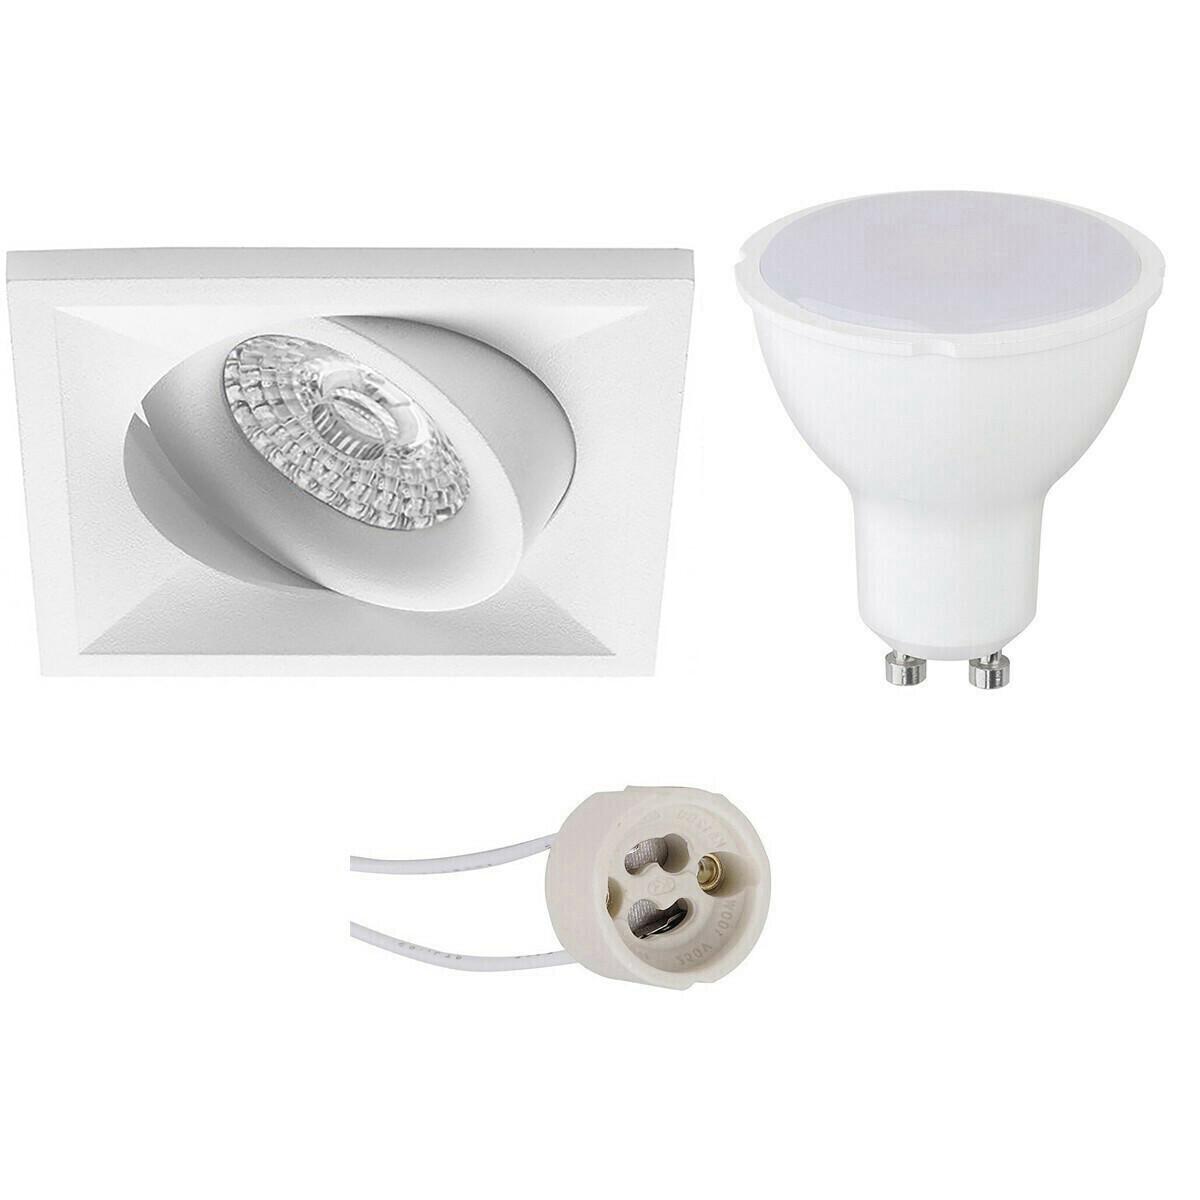 LED Spot Set - Pragmi Qiundo Pro - GU10 Fitting - Inbouw Vierkant - Mat Wit - 4W - Natuurlijk Wit 42